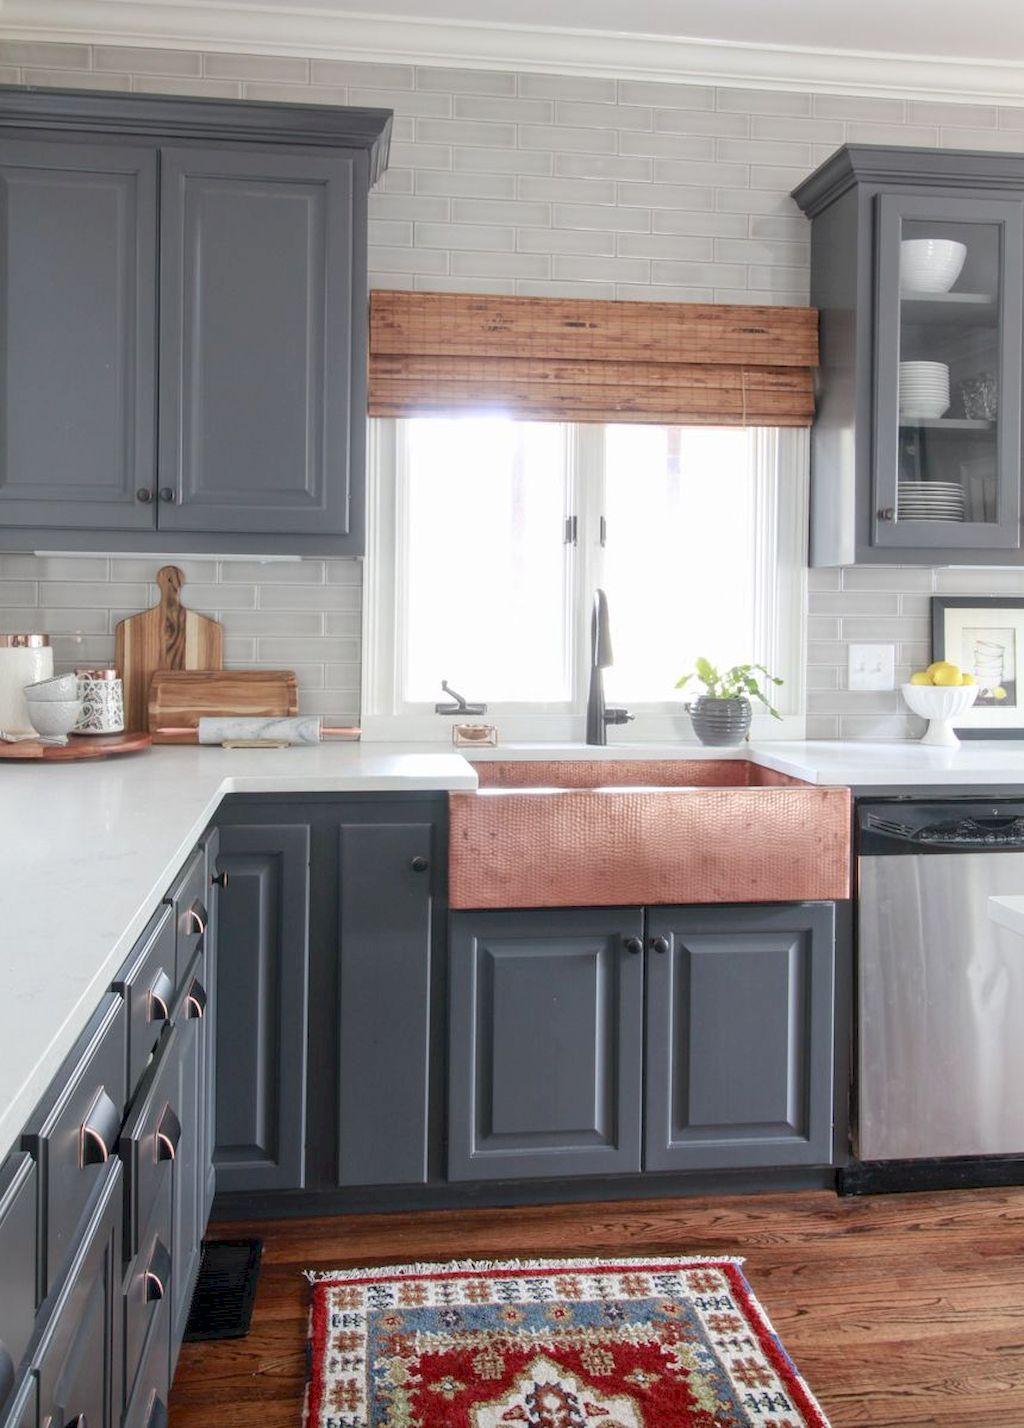 Best Farmhouse Kitchen Decor Ideas New Kitchen Cabinets